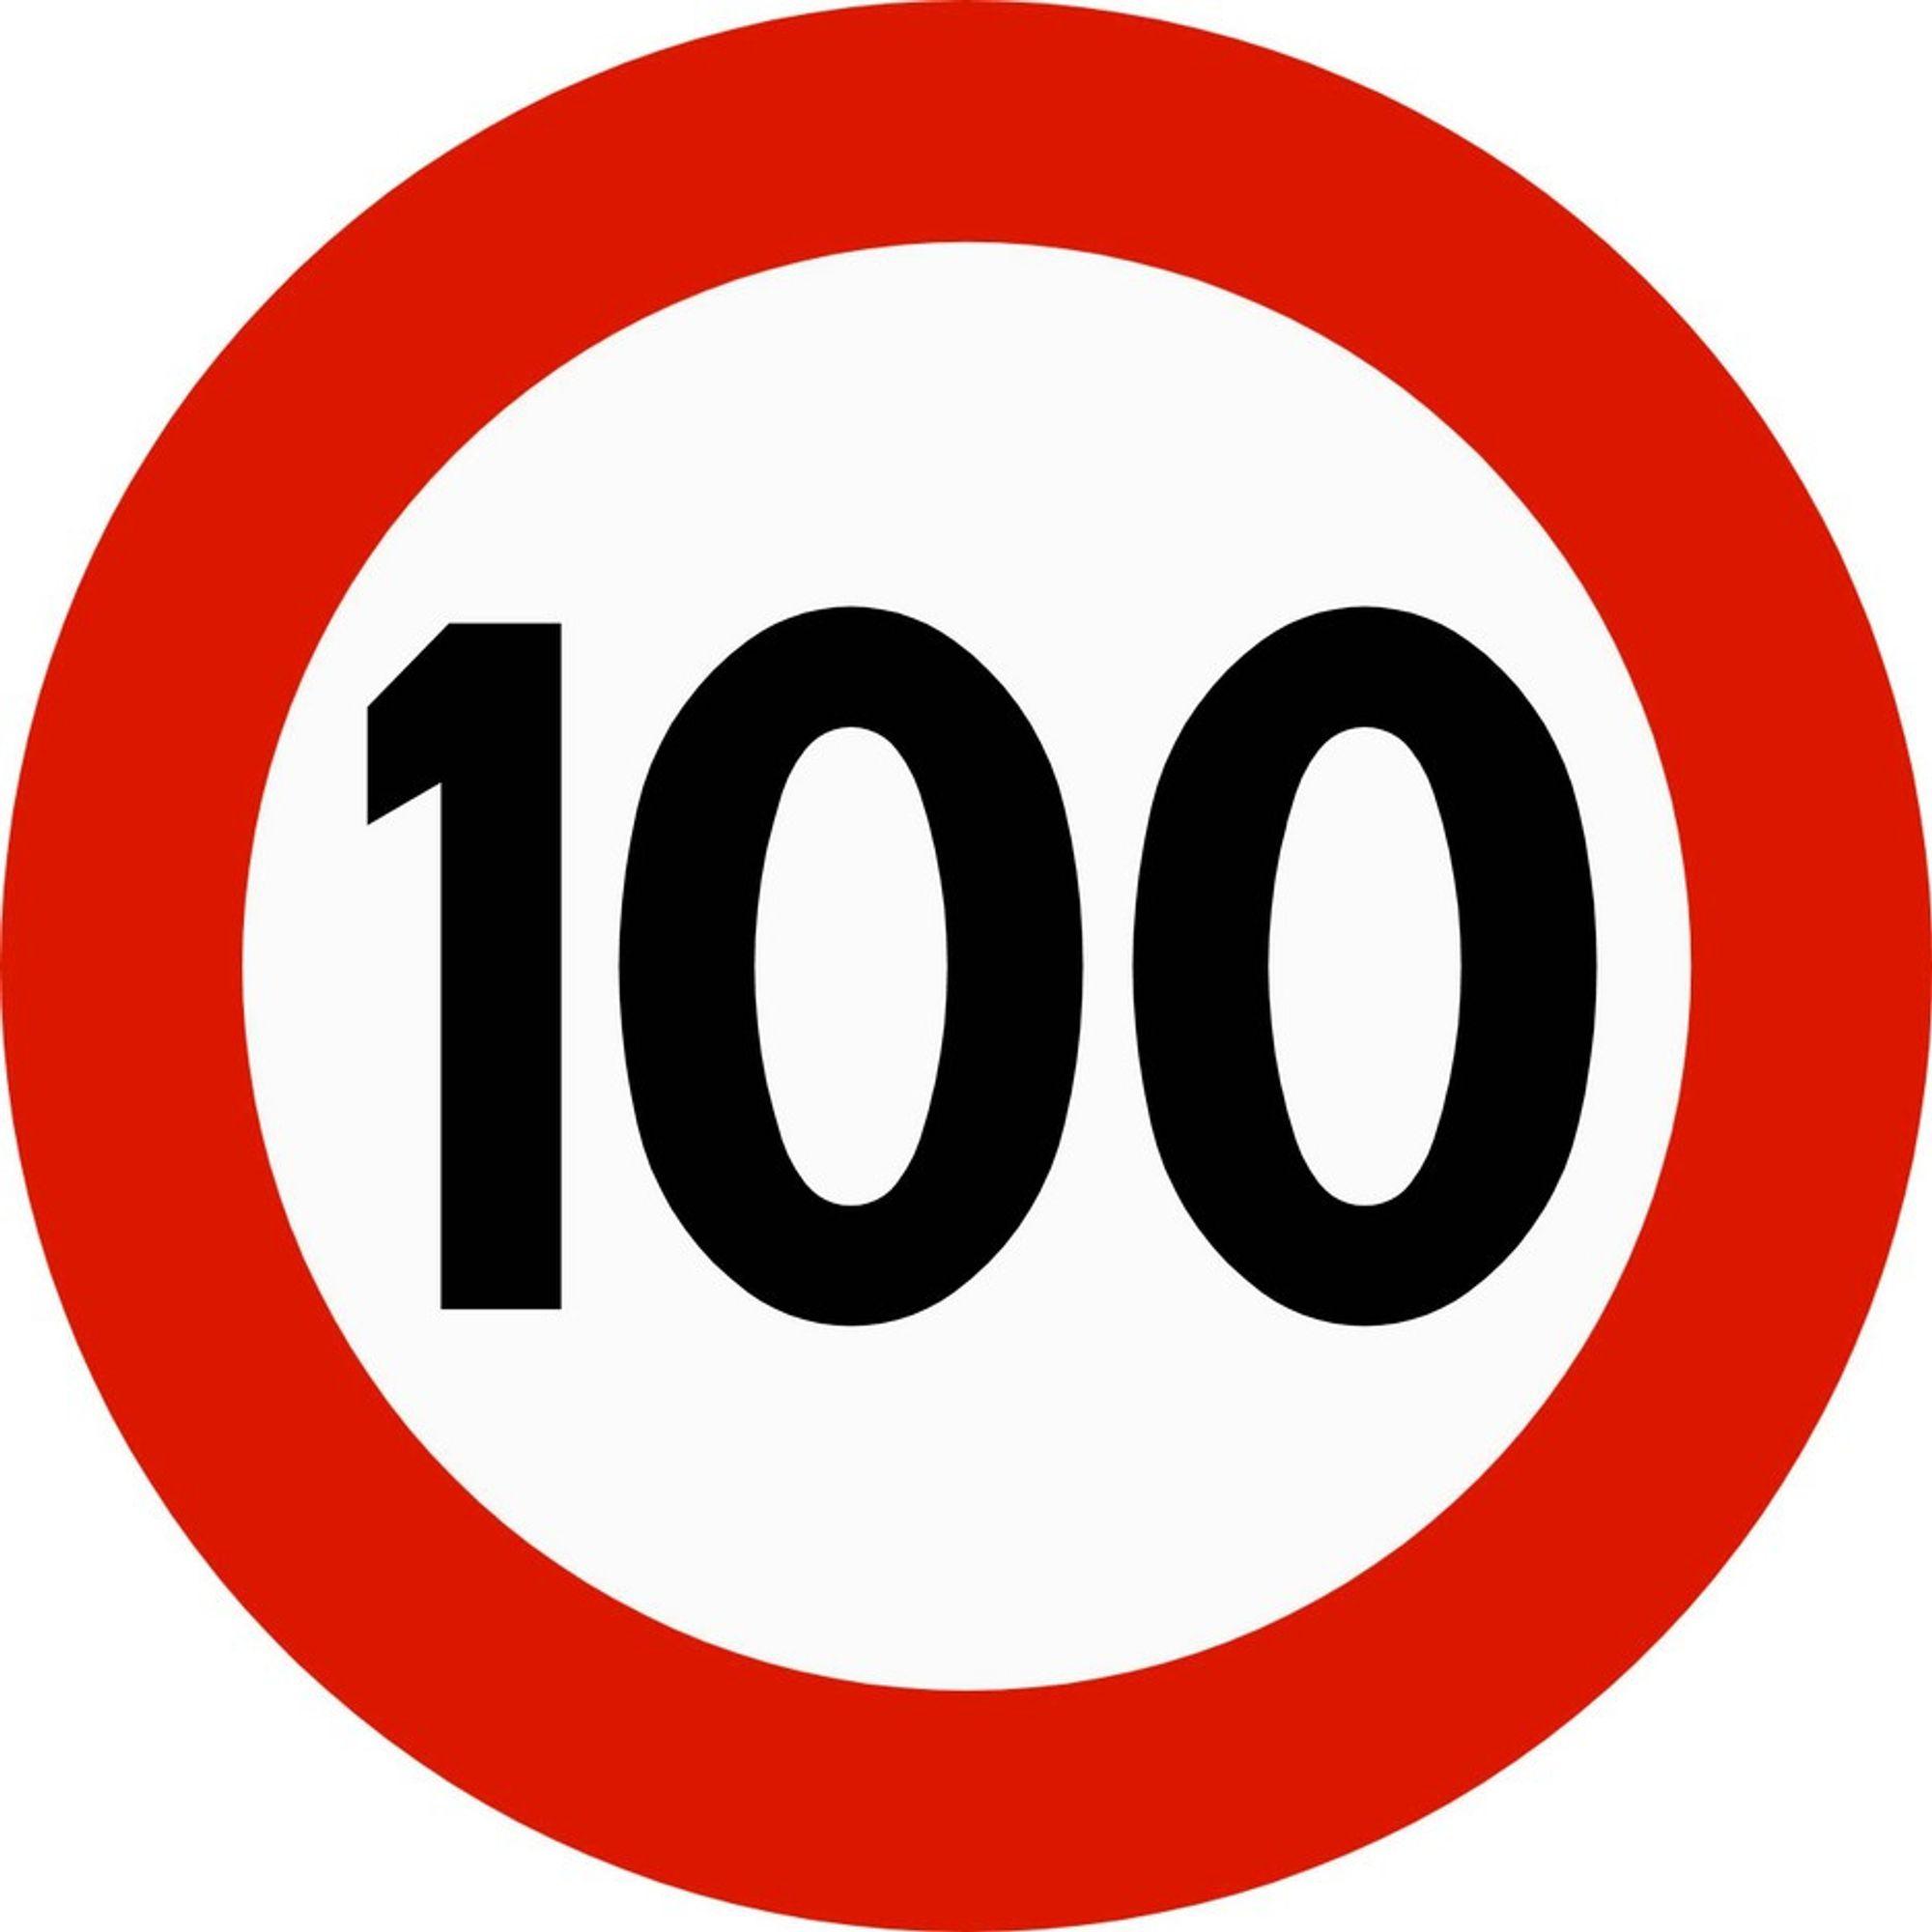 Navarsete: Maksfart framleis 100 km/t